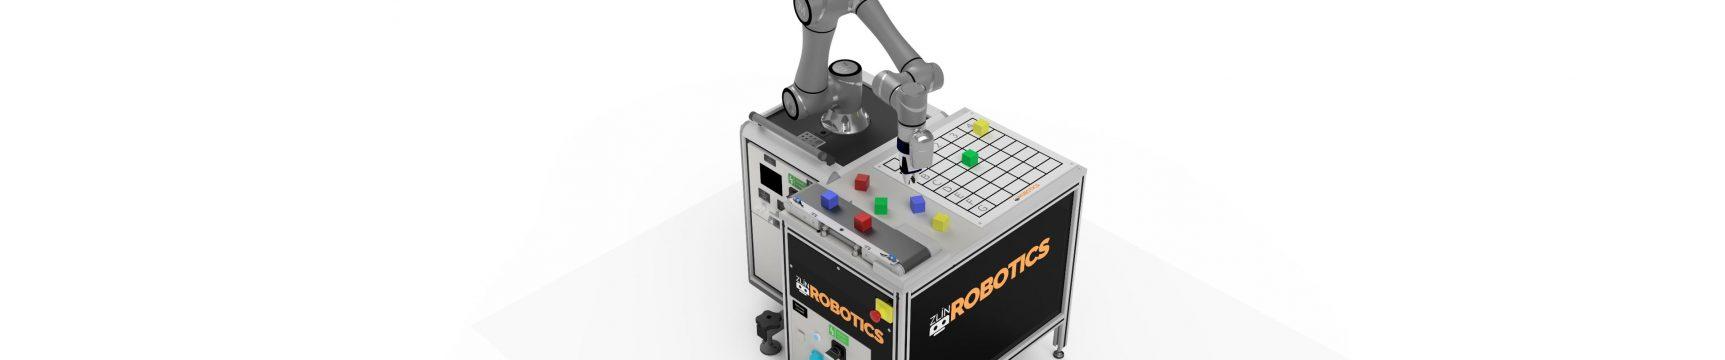 ZLÍN ROBOTICS s.r.o.